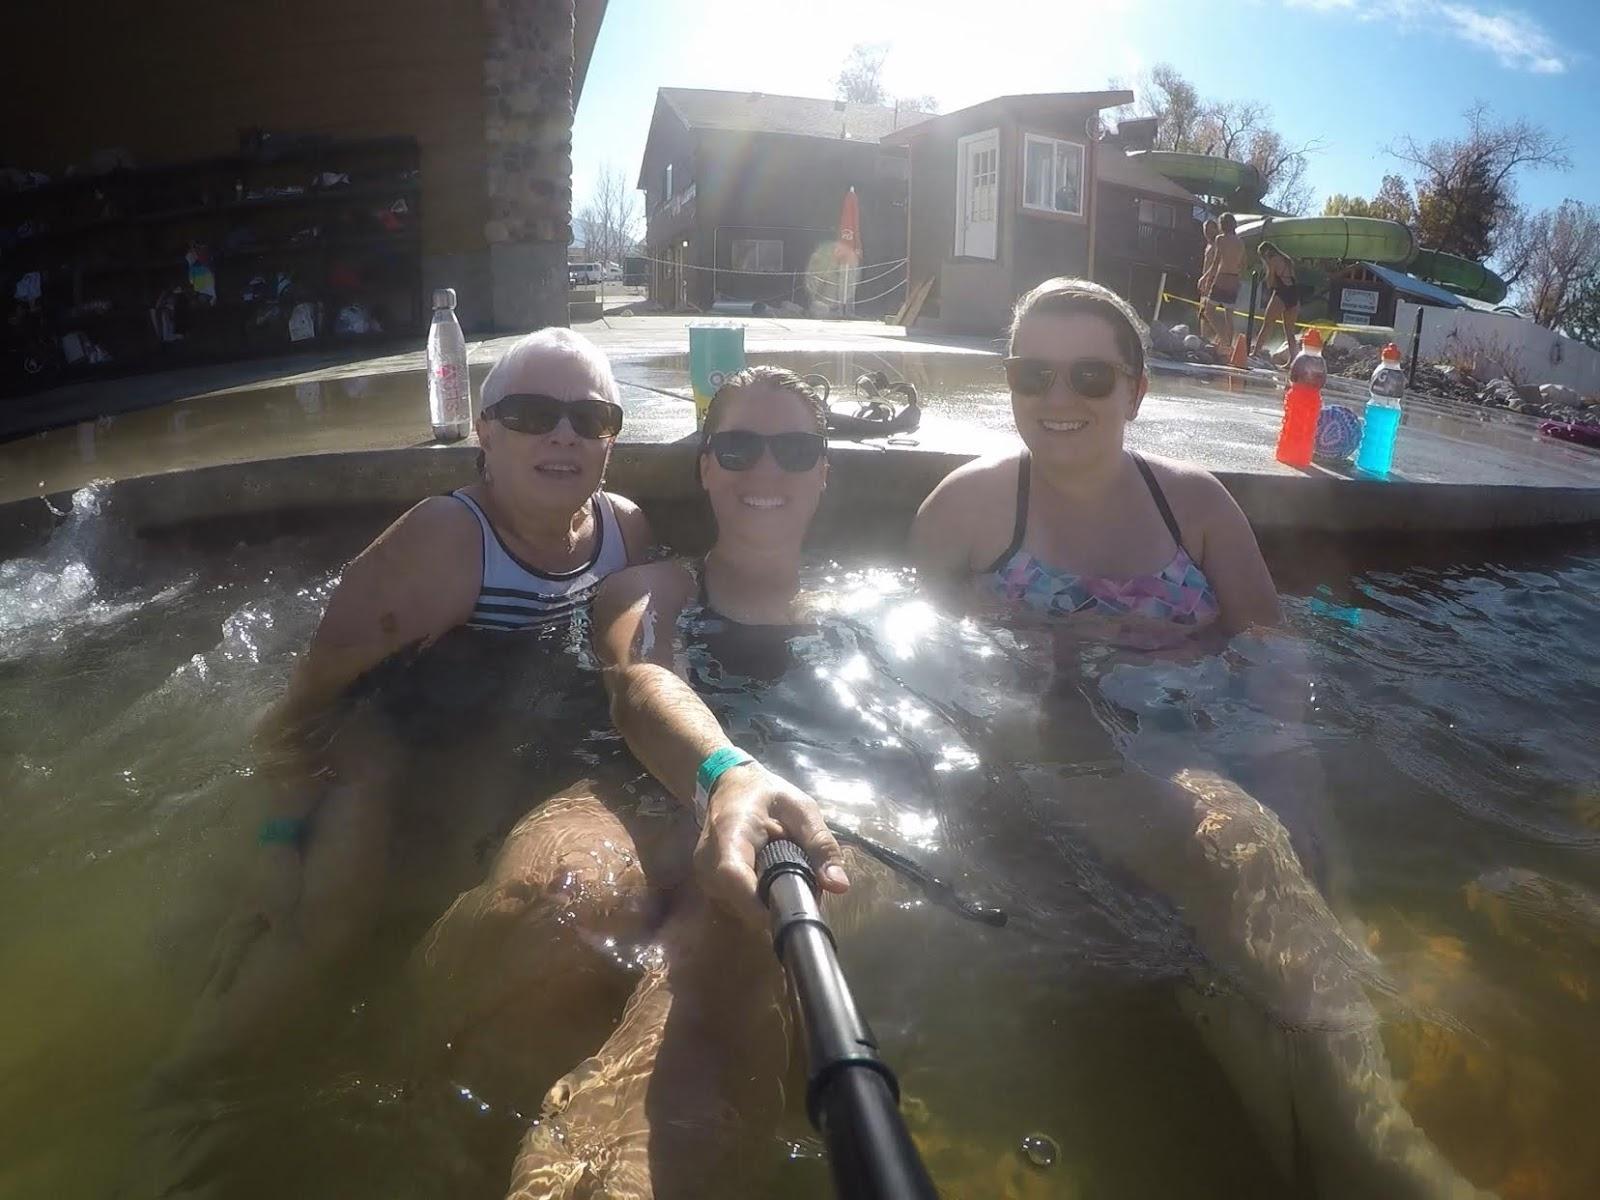 Soaking at Crystal Hot Springs, Hot Springs in Utah